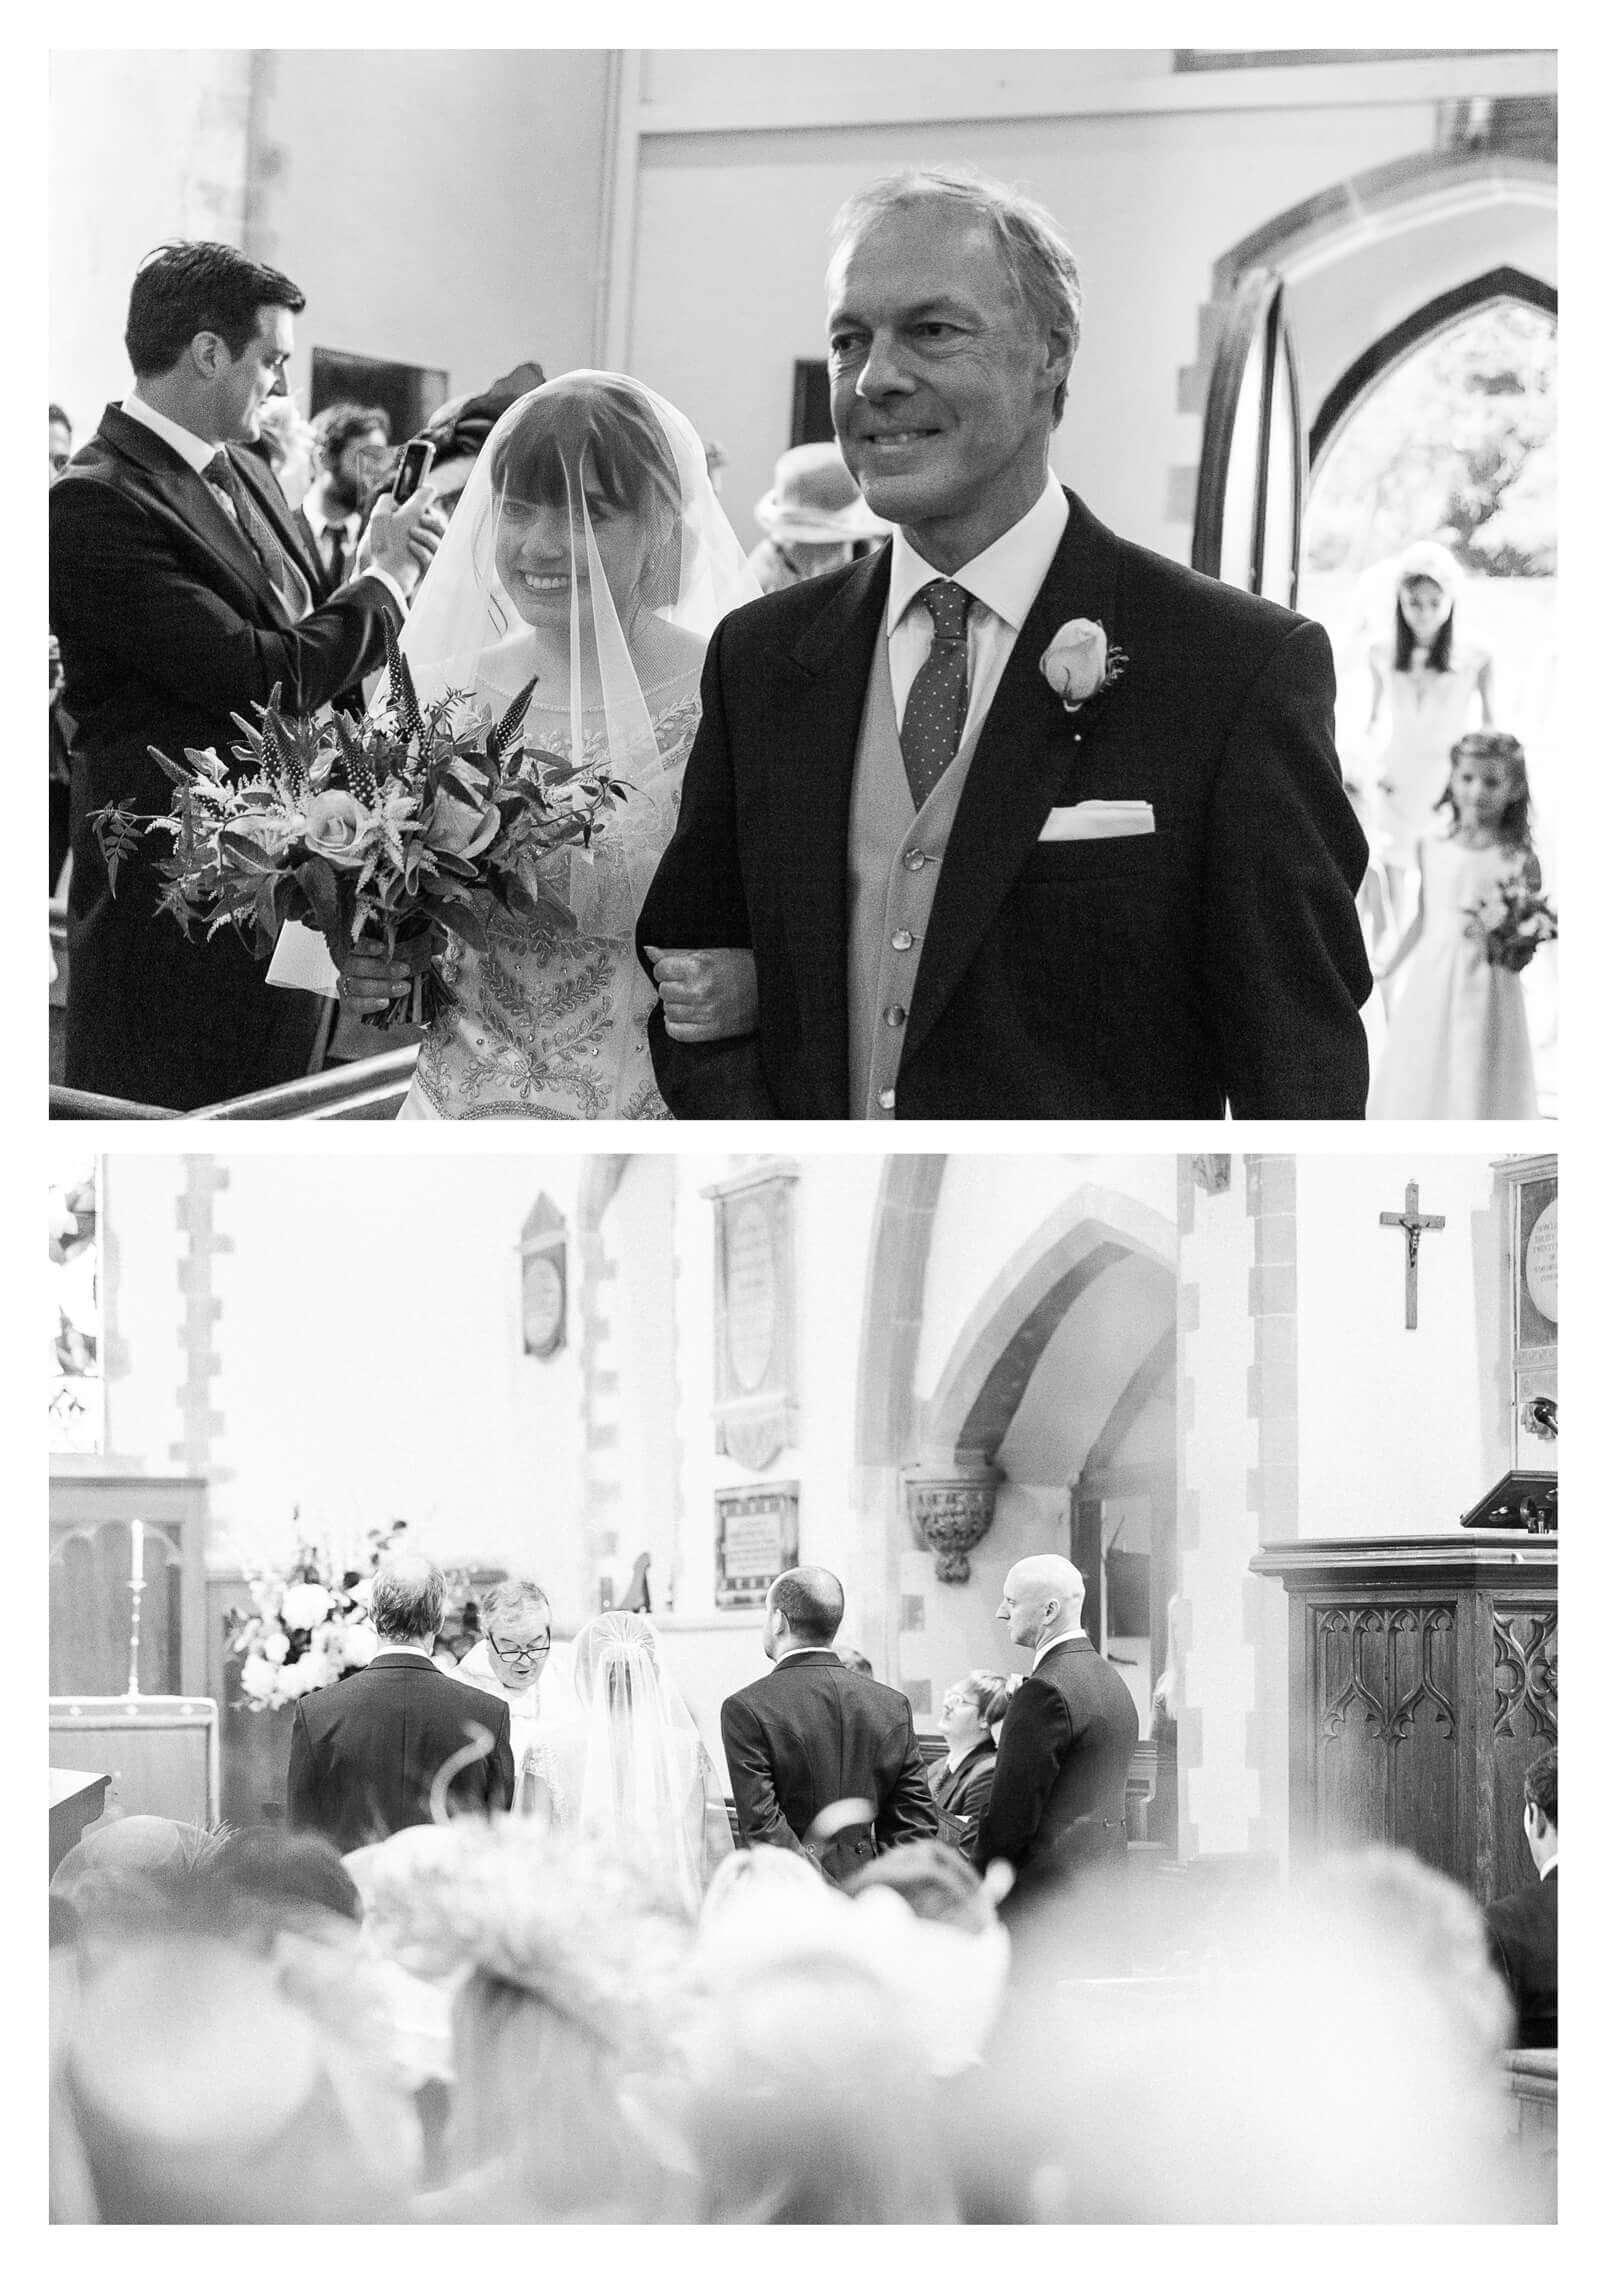 St James Church wedding ceremony in Stedham | West Sussex Wedding Photographer